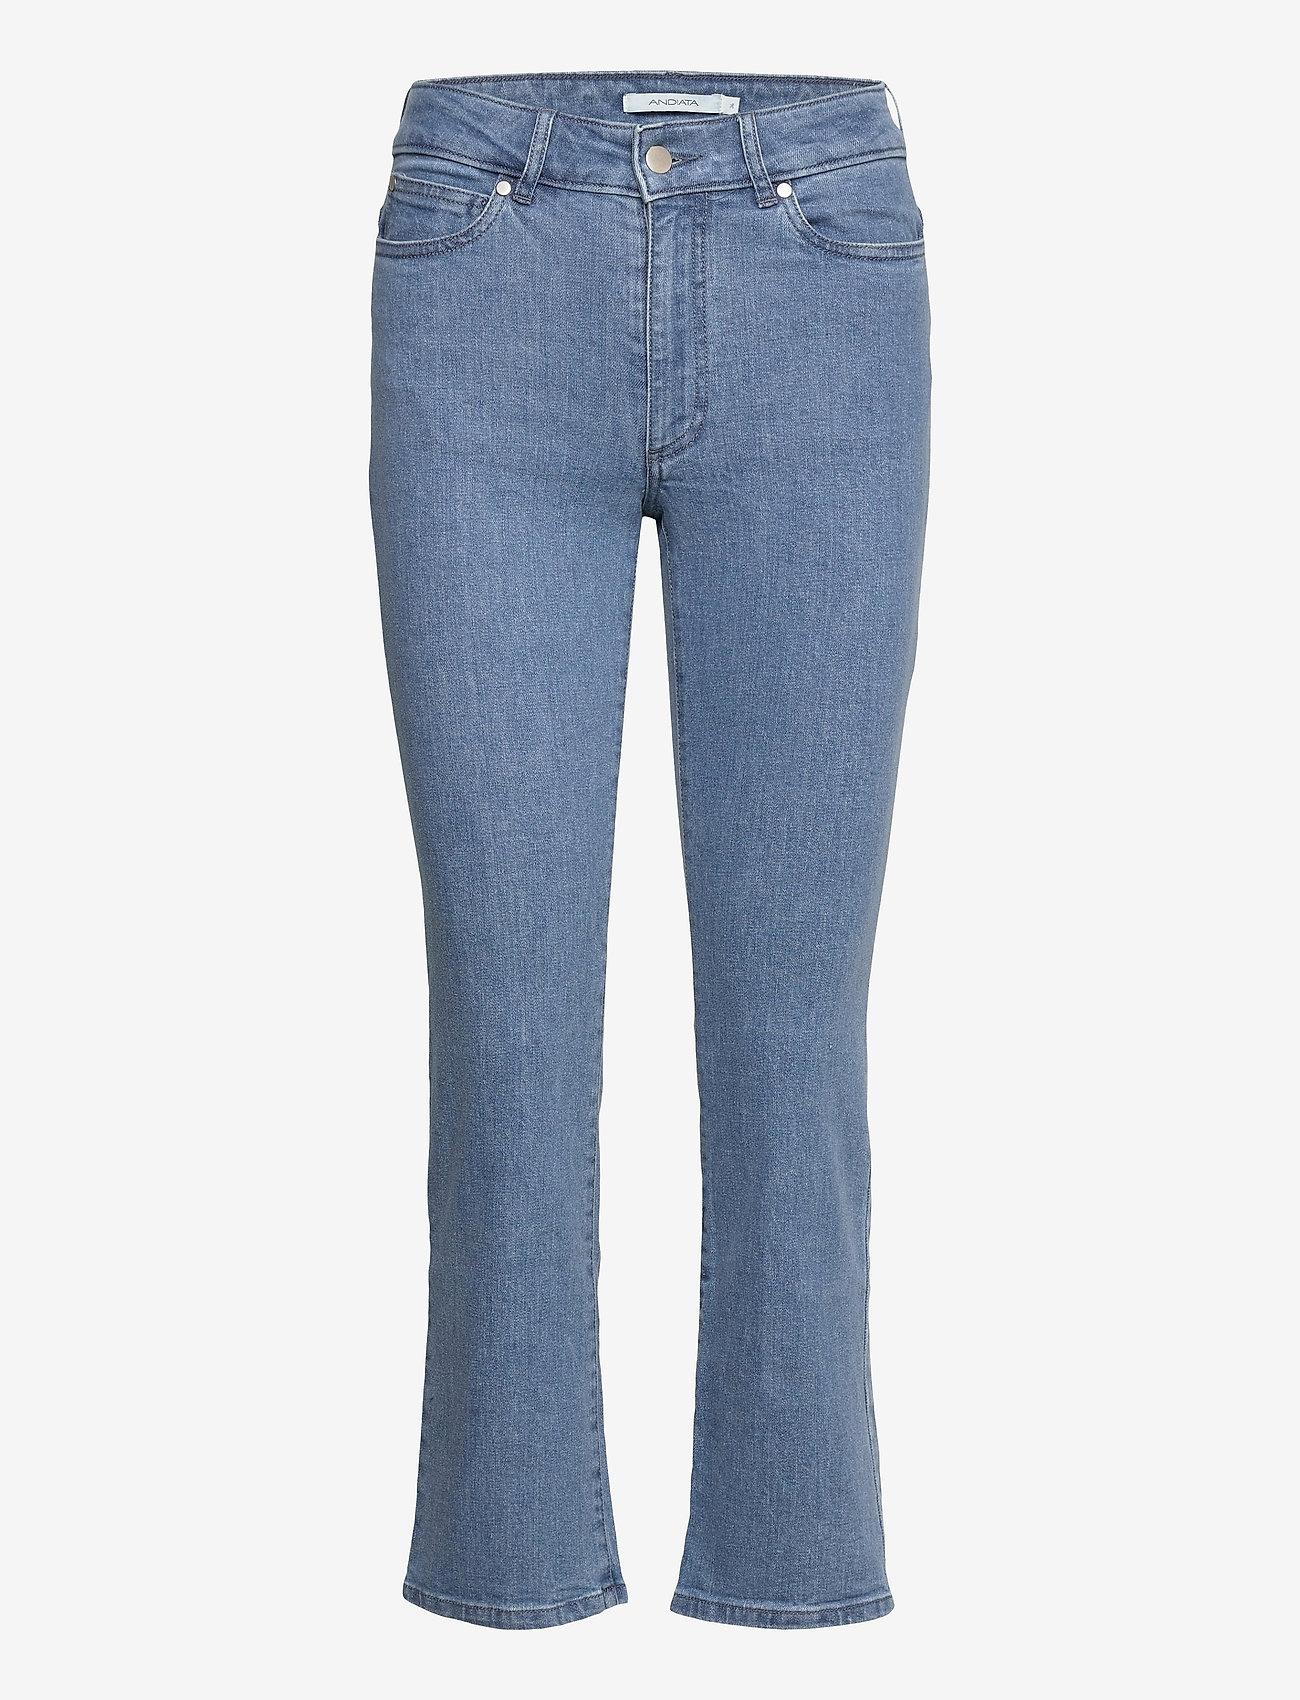 Andiata - Doryla Jeans - schlaghosen - blue - 1